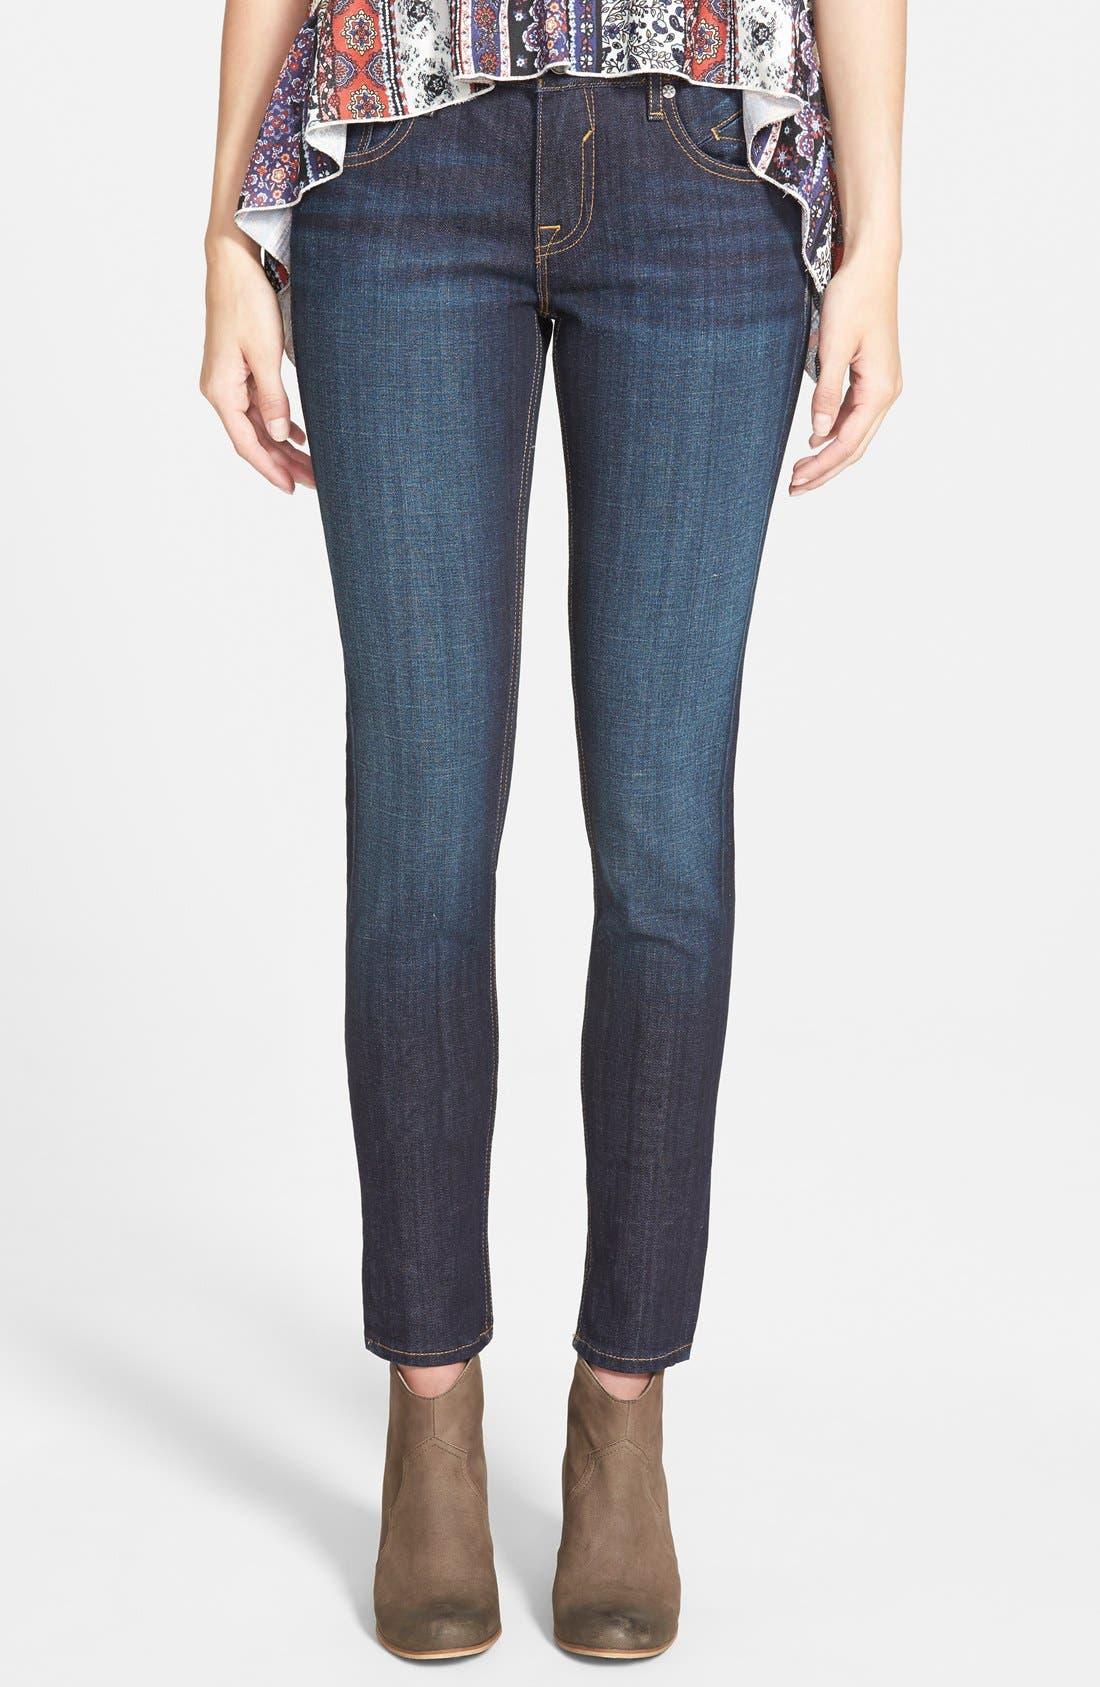 Alternate Image 1 Selected - Vigoss 'Chelsea' Skinny Jeans (Dark Wash)